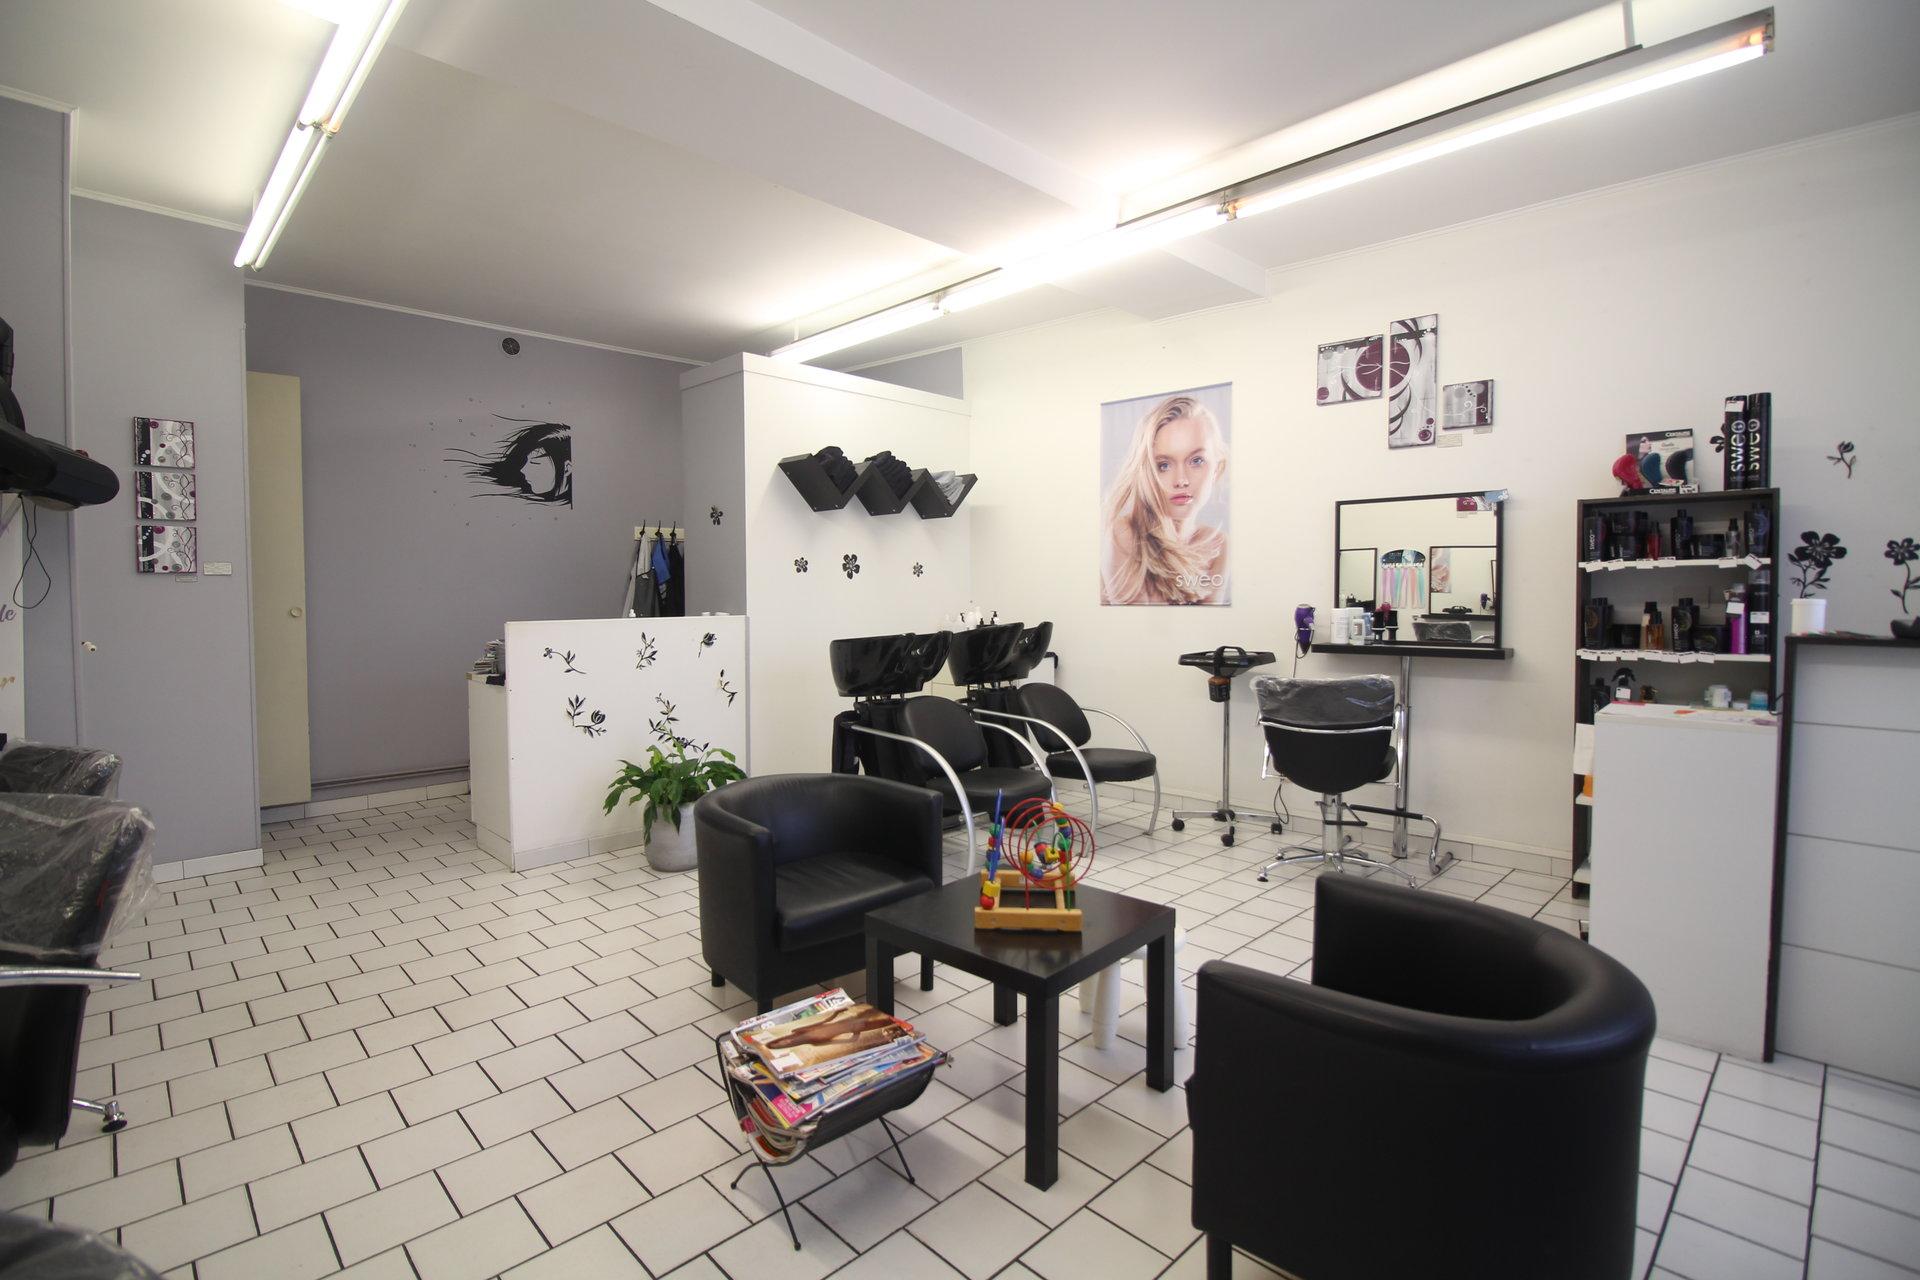 Fond de commerce : salon de coiffure